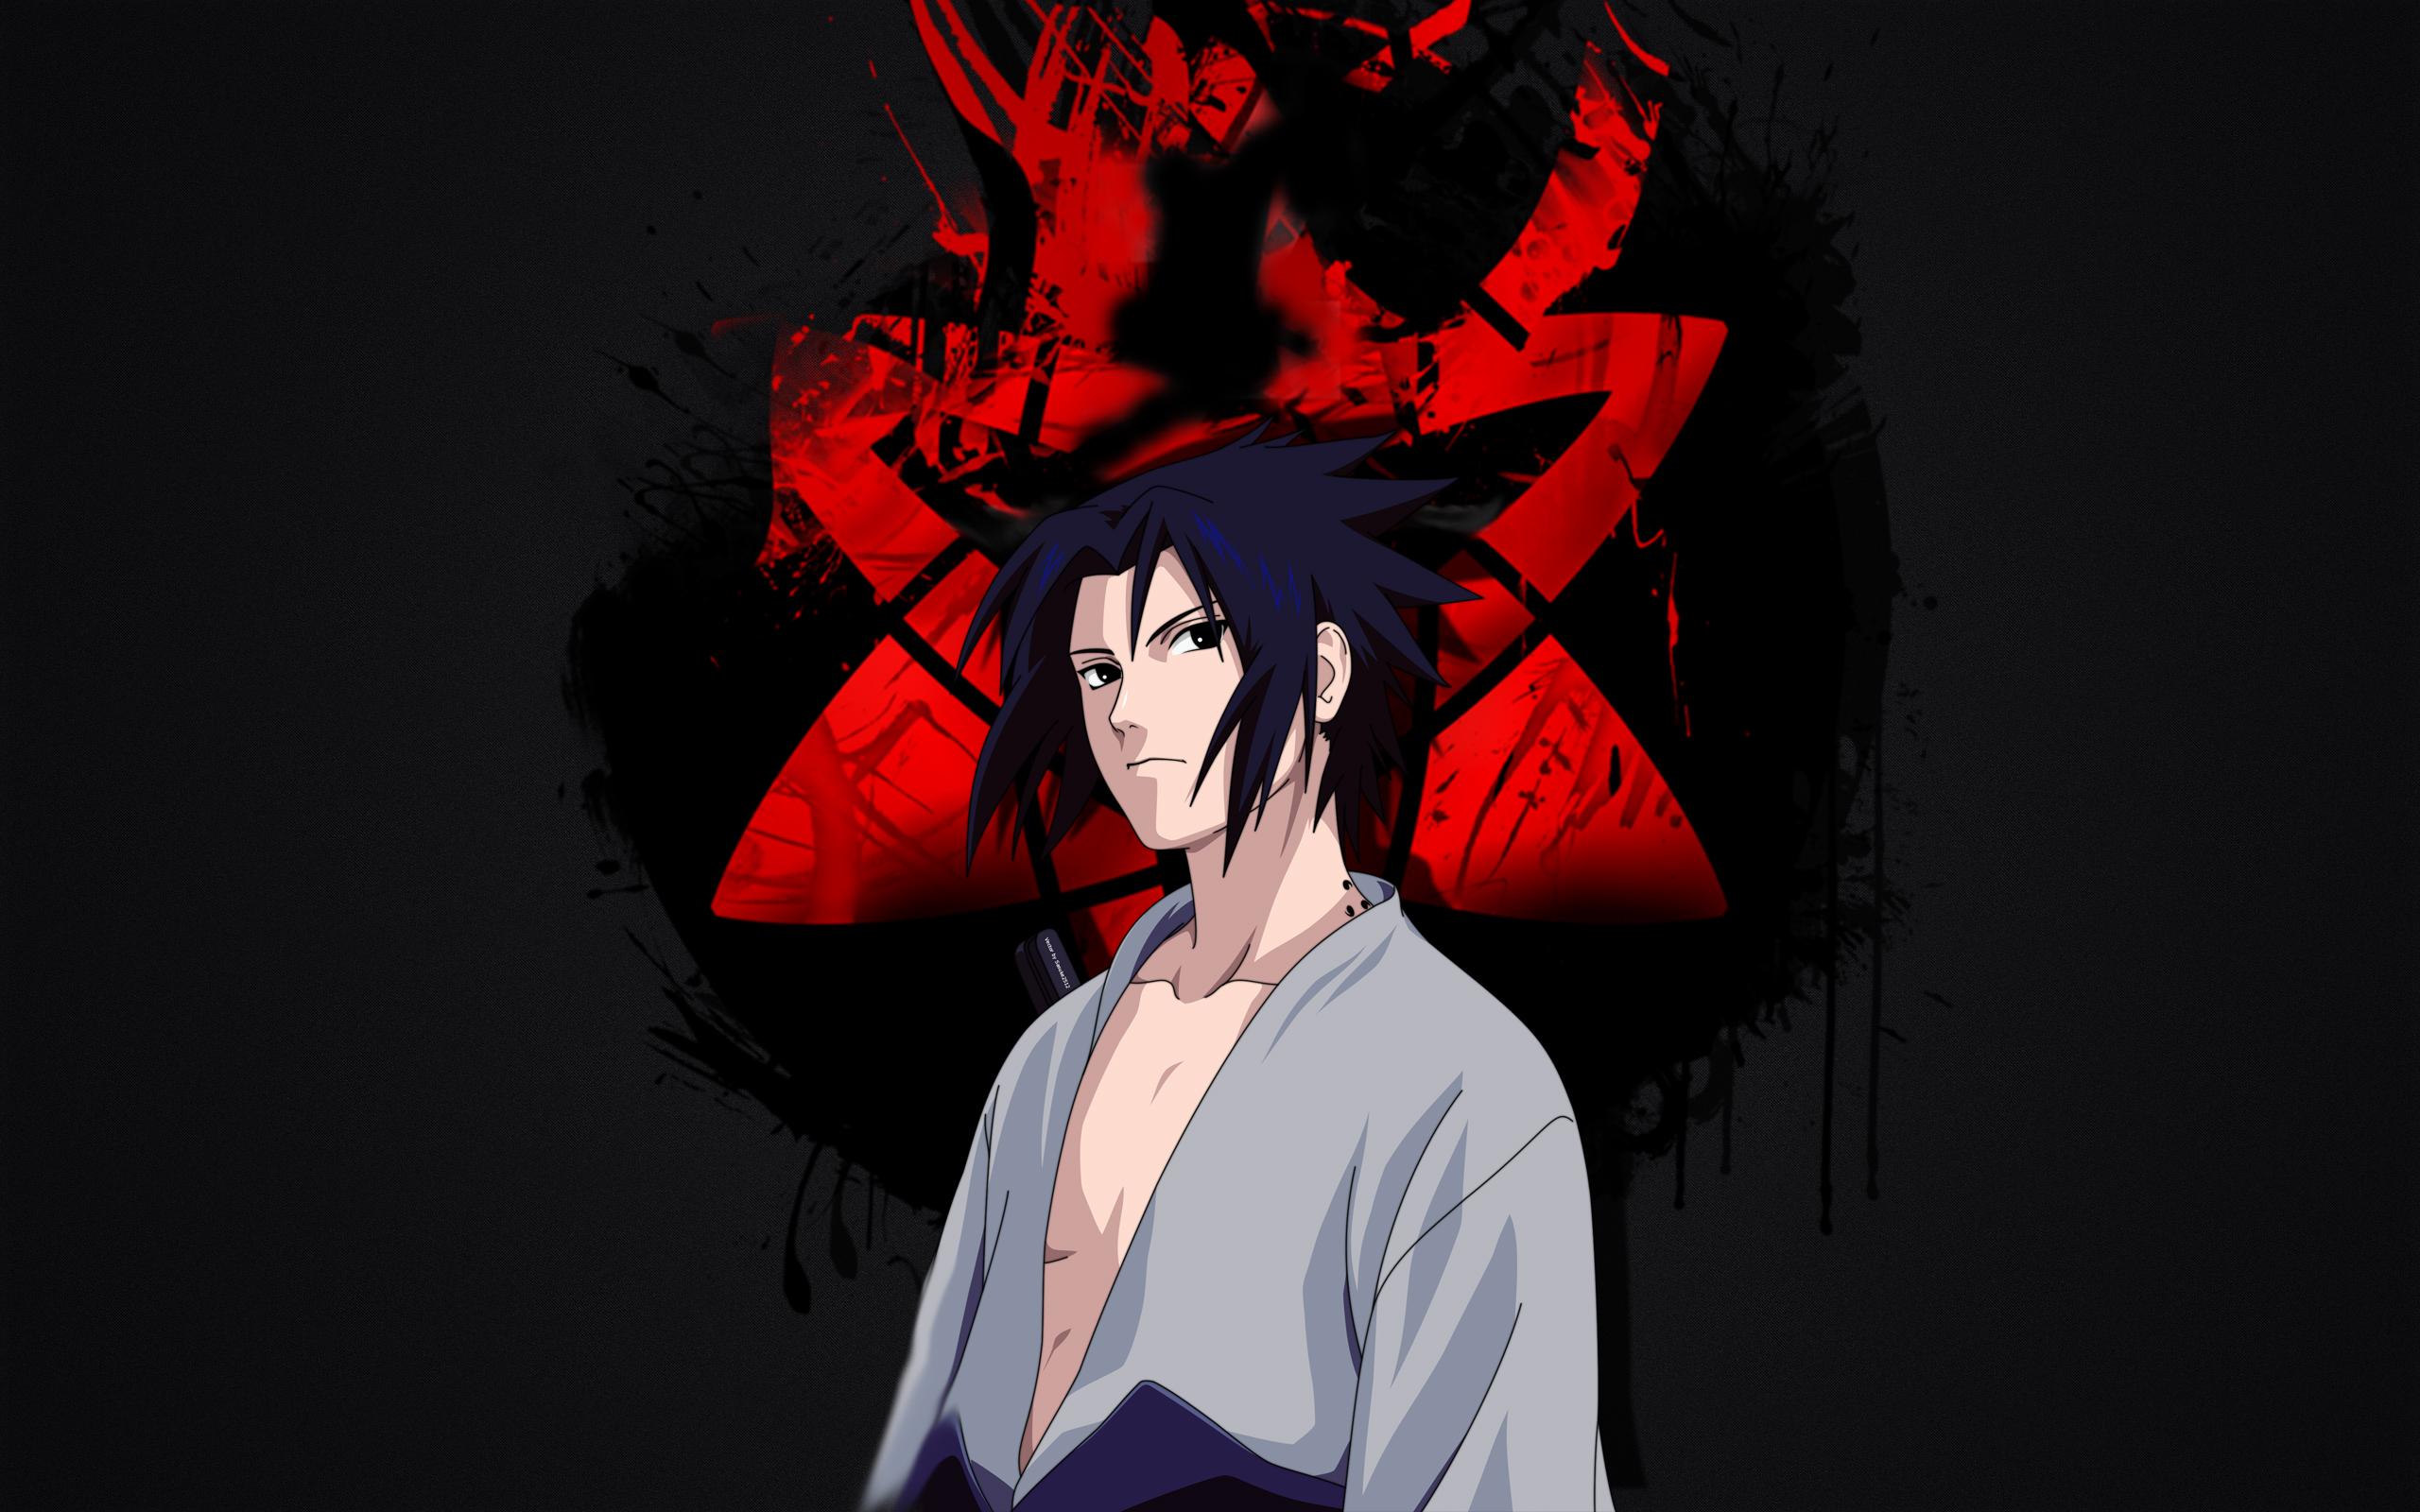 Wallpaper Of Anime, Naruto, Sasuke Uchiha, Sharingan - Uchiha Wallpaper Sasuke - HD Wallpaper